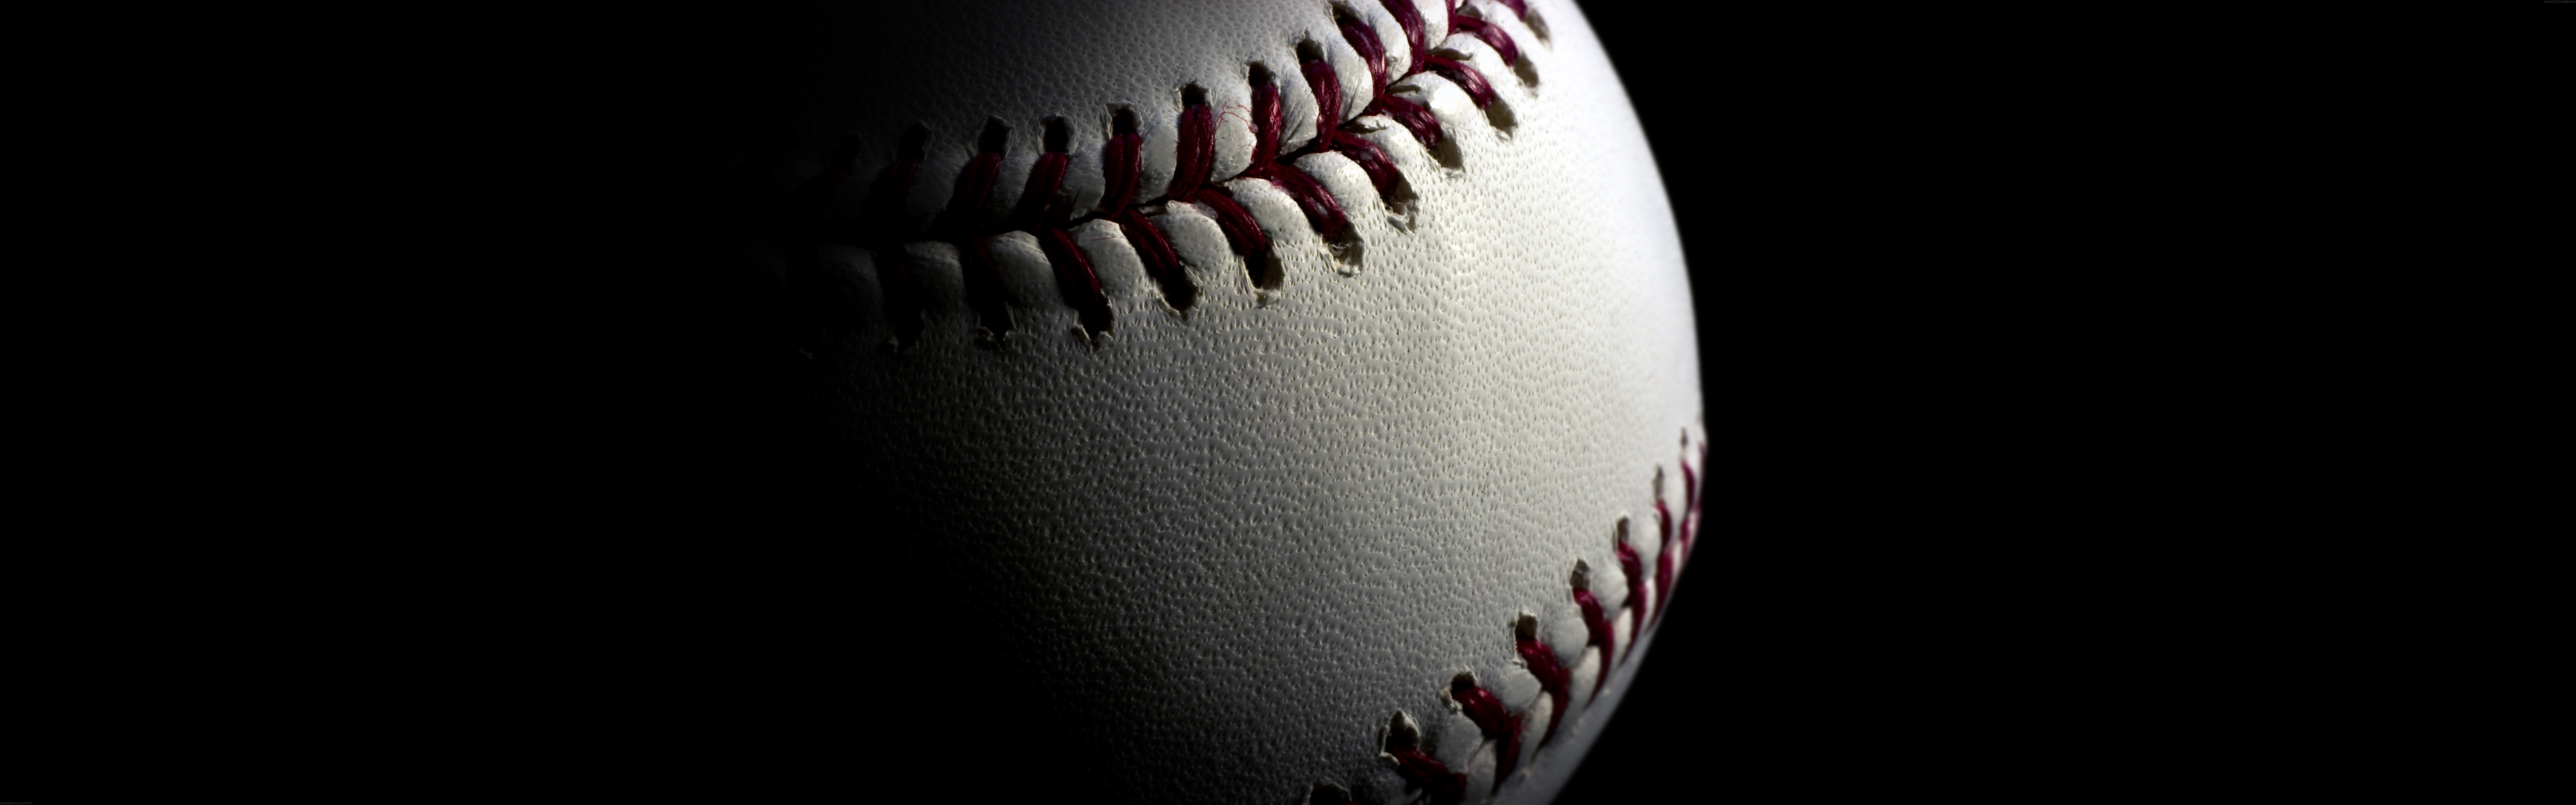 Baseball Backgrounds for Myspace wallpaper wallpaper hd background 5120x1600